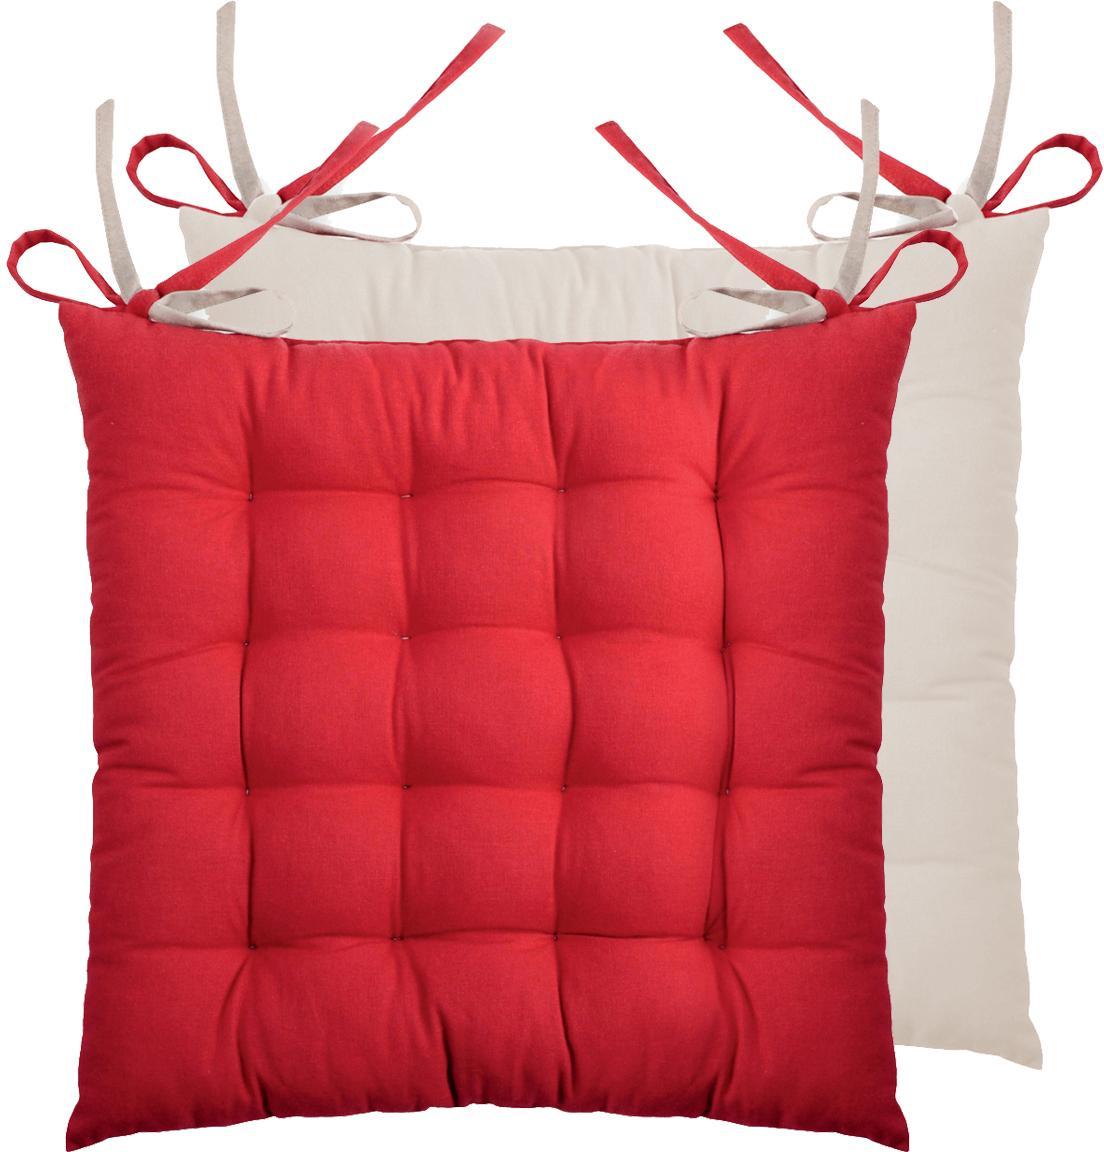 Cuscino reversibile Duo rosso/beige, 2 pz., Rosso, beige, Larg. 40 x Lung. 40 cm